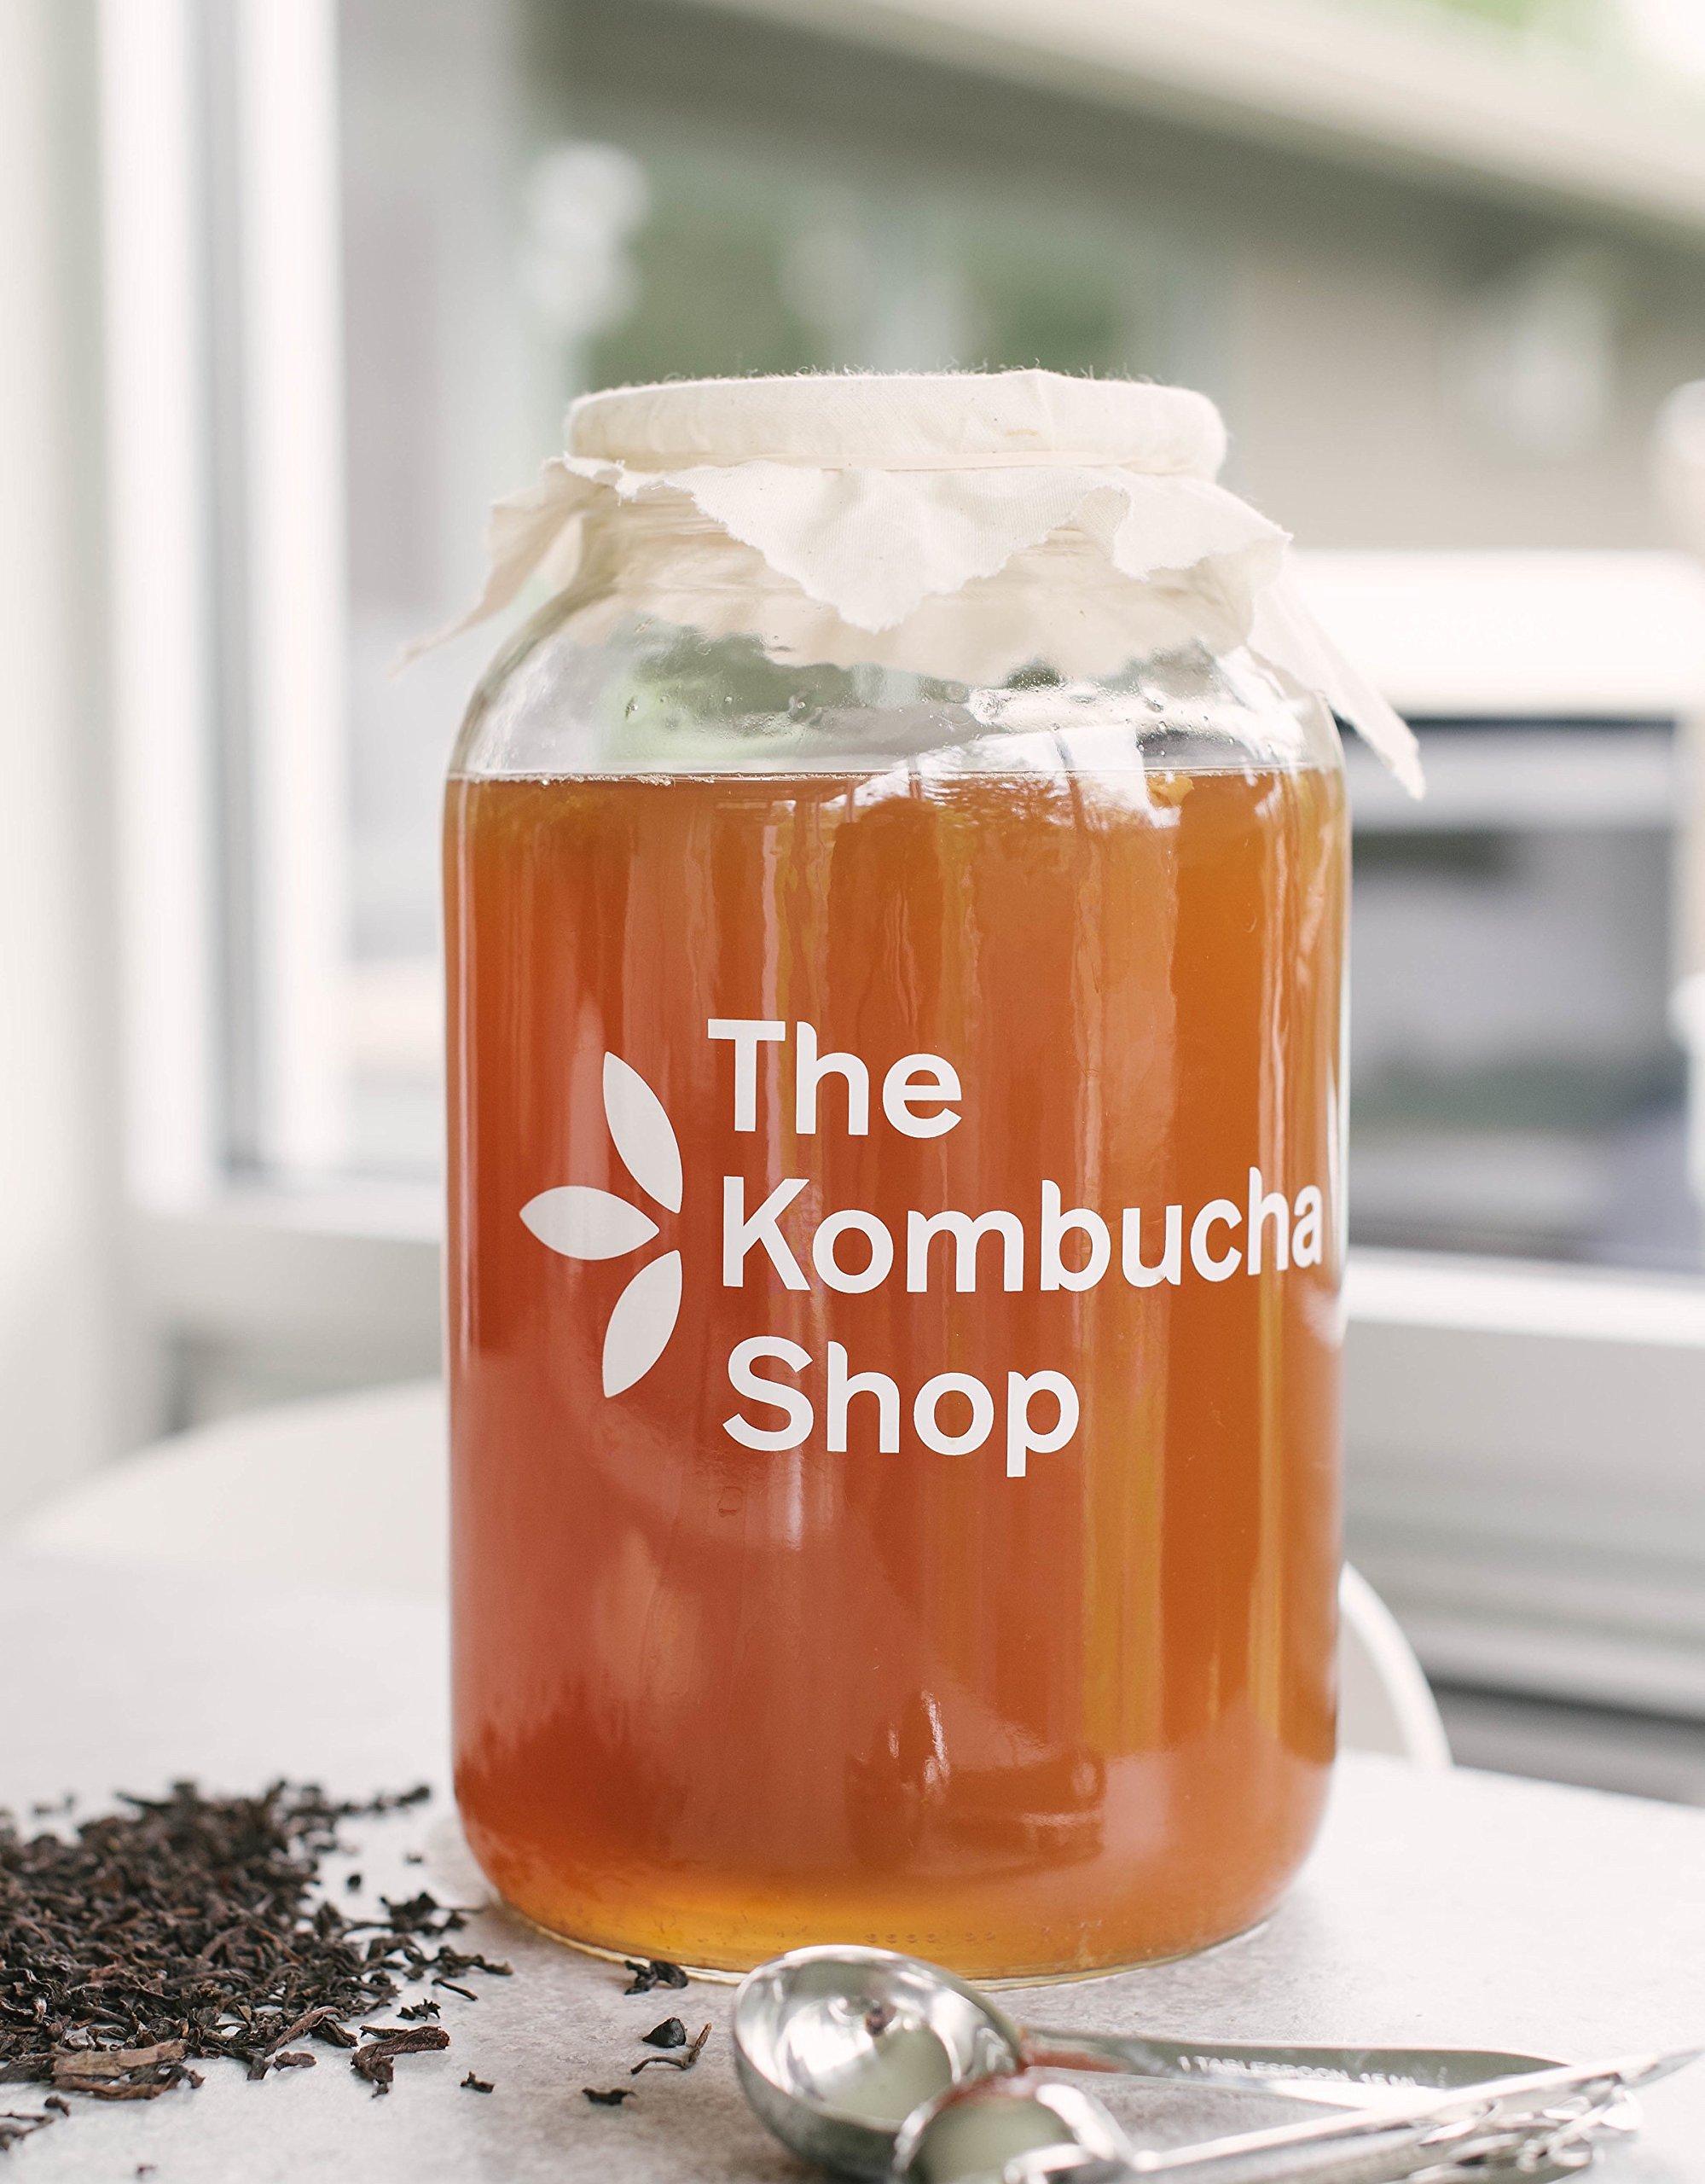 Kombucha Brewing Kit with Organic Kombucha Scoby. Includes Glass Brew Jar, Organic Kombucha Loose Leaf Tea, Temperature Gauge, Organic Sugar and More! by The Kombucha Shop (Image #3)